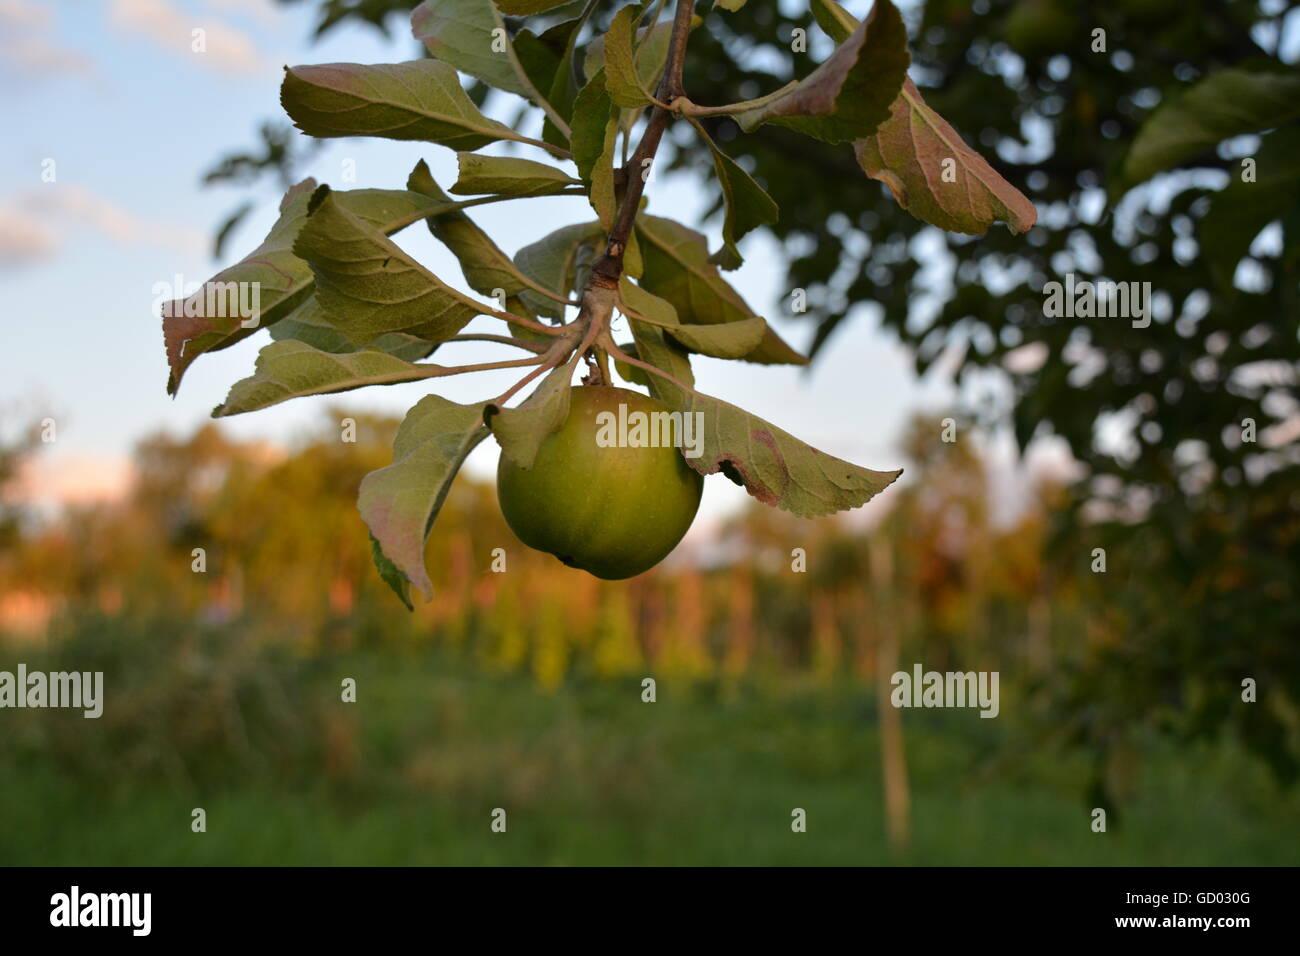 Grüner Apfel im Baum Stockbild